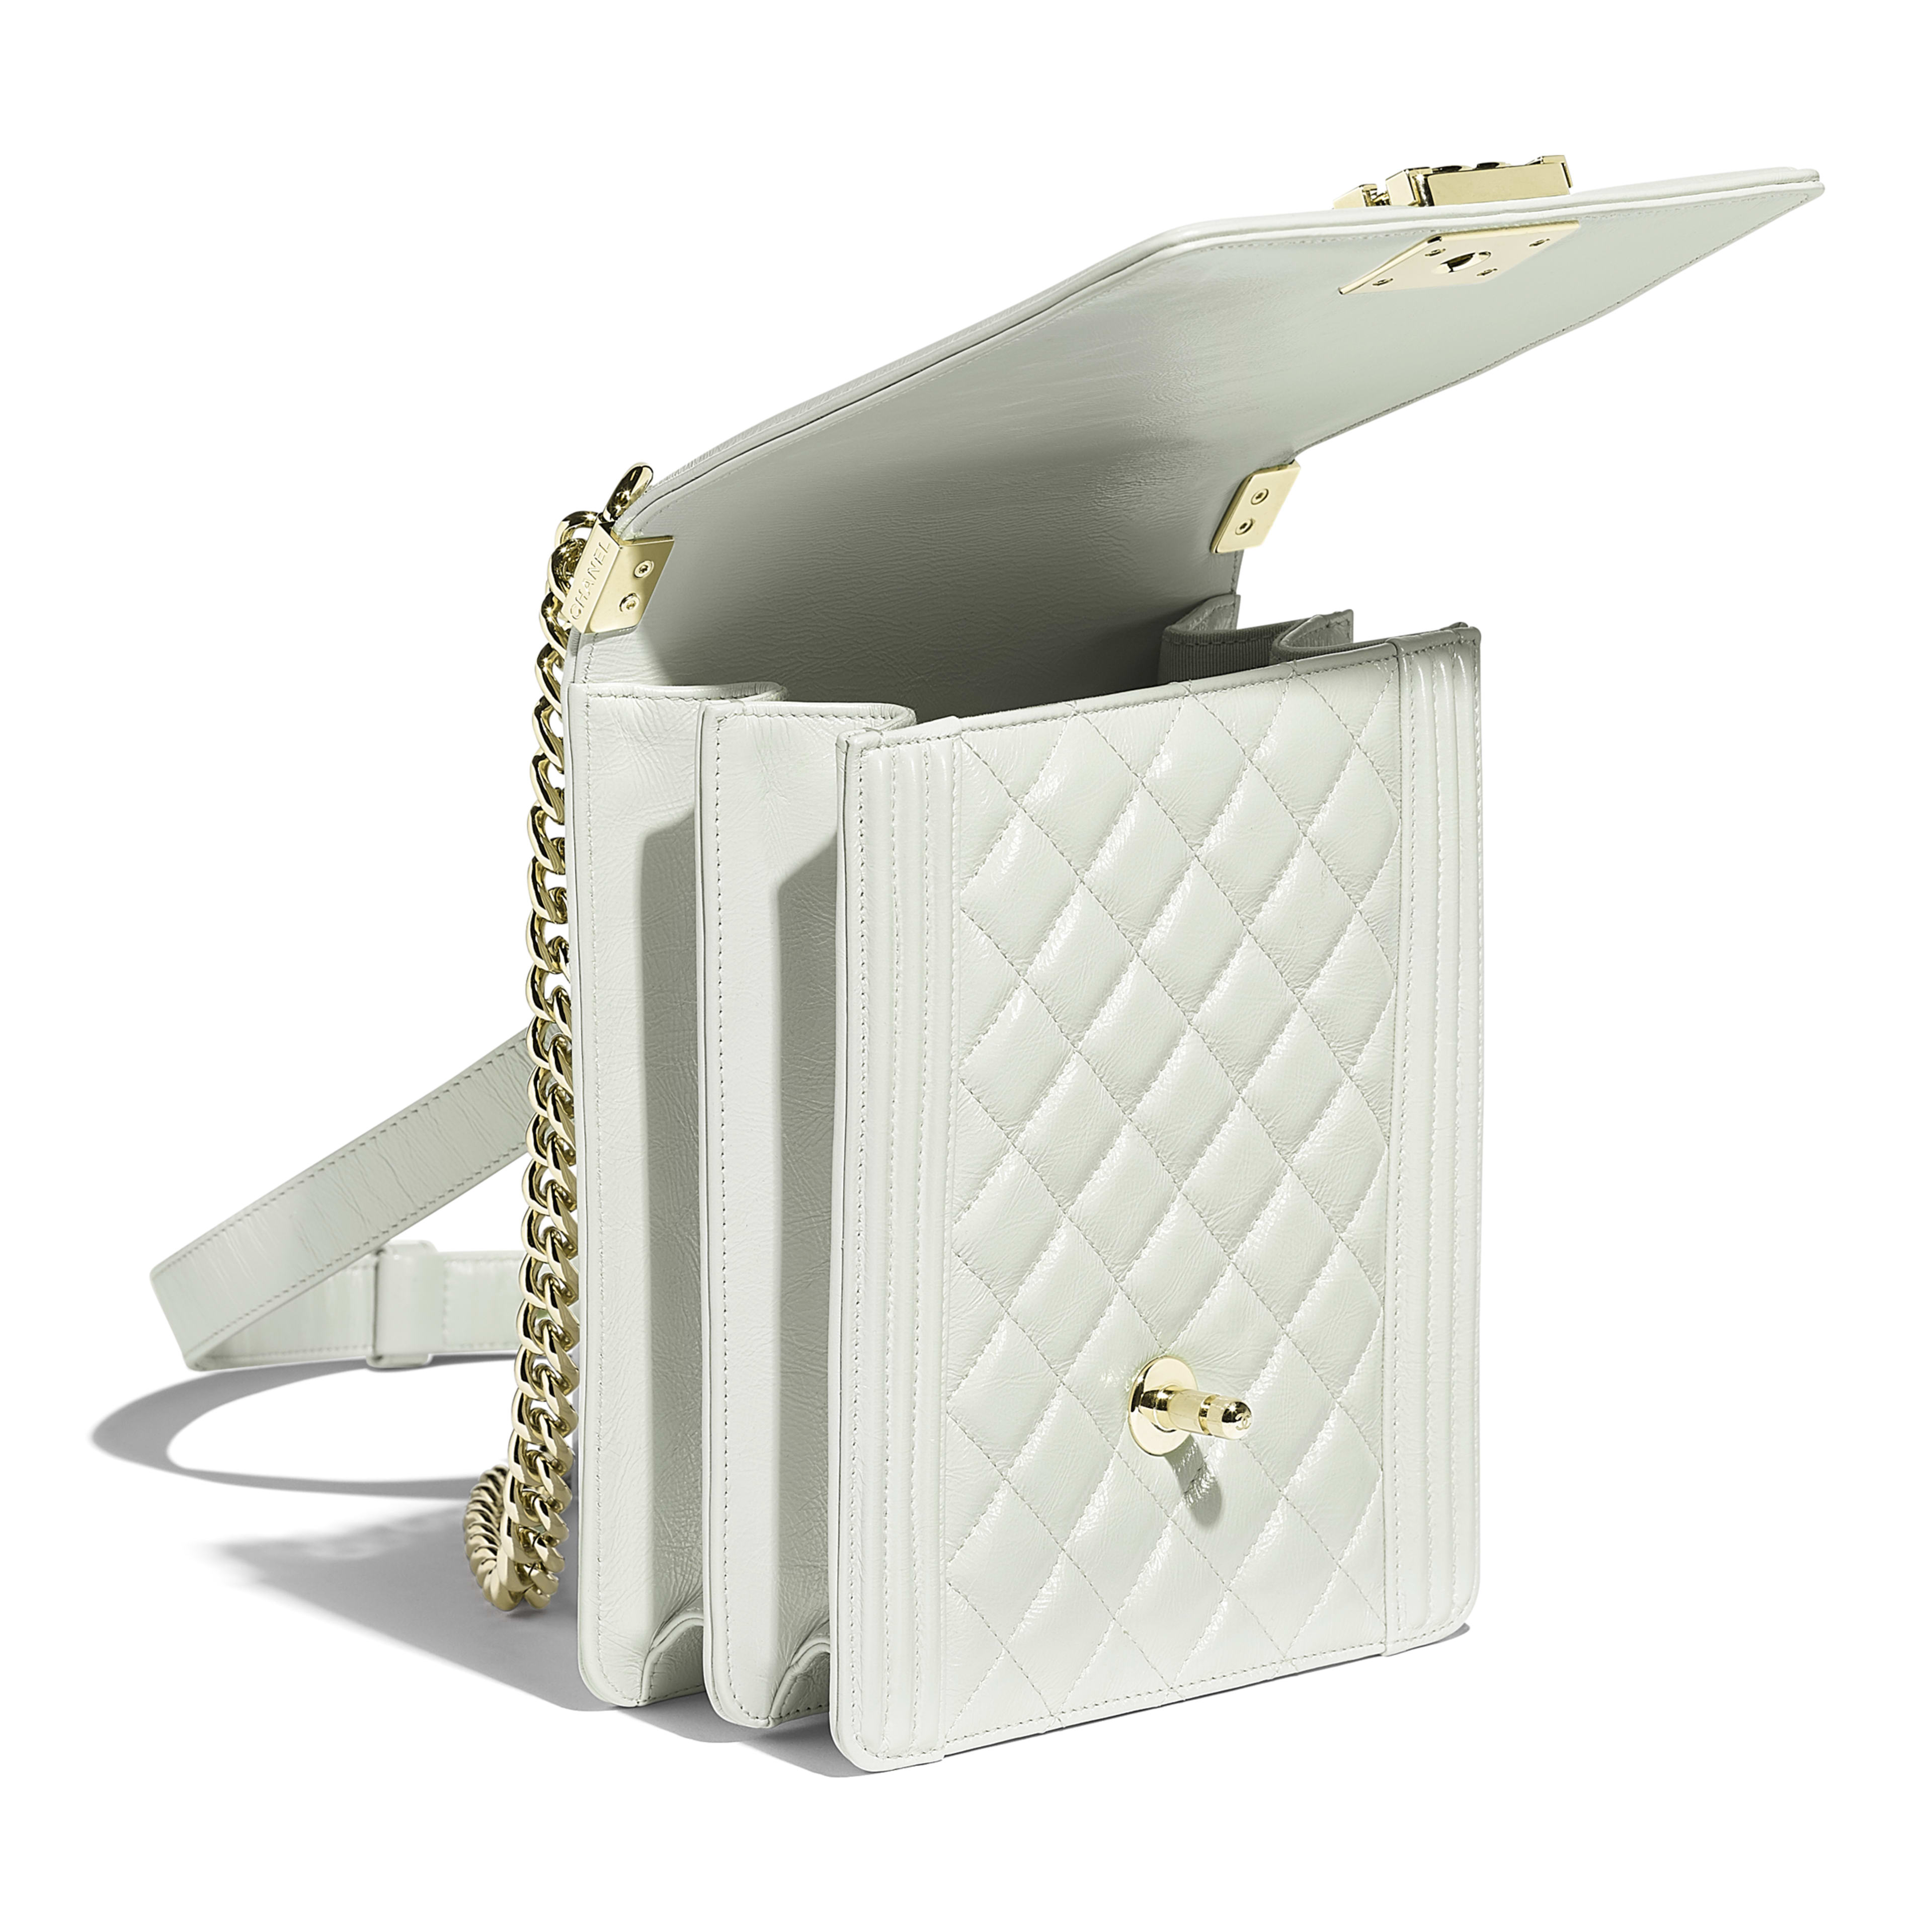 BOY CHANEL Handbag - Light Gray - Iridescent Calfskin & Gold-Tone Metal - Other view - see full sized version